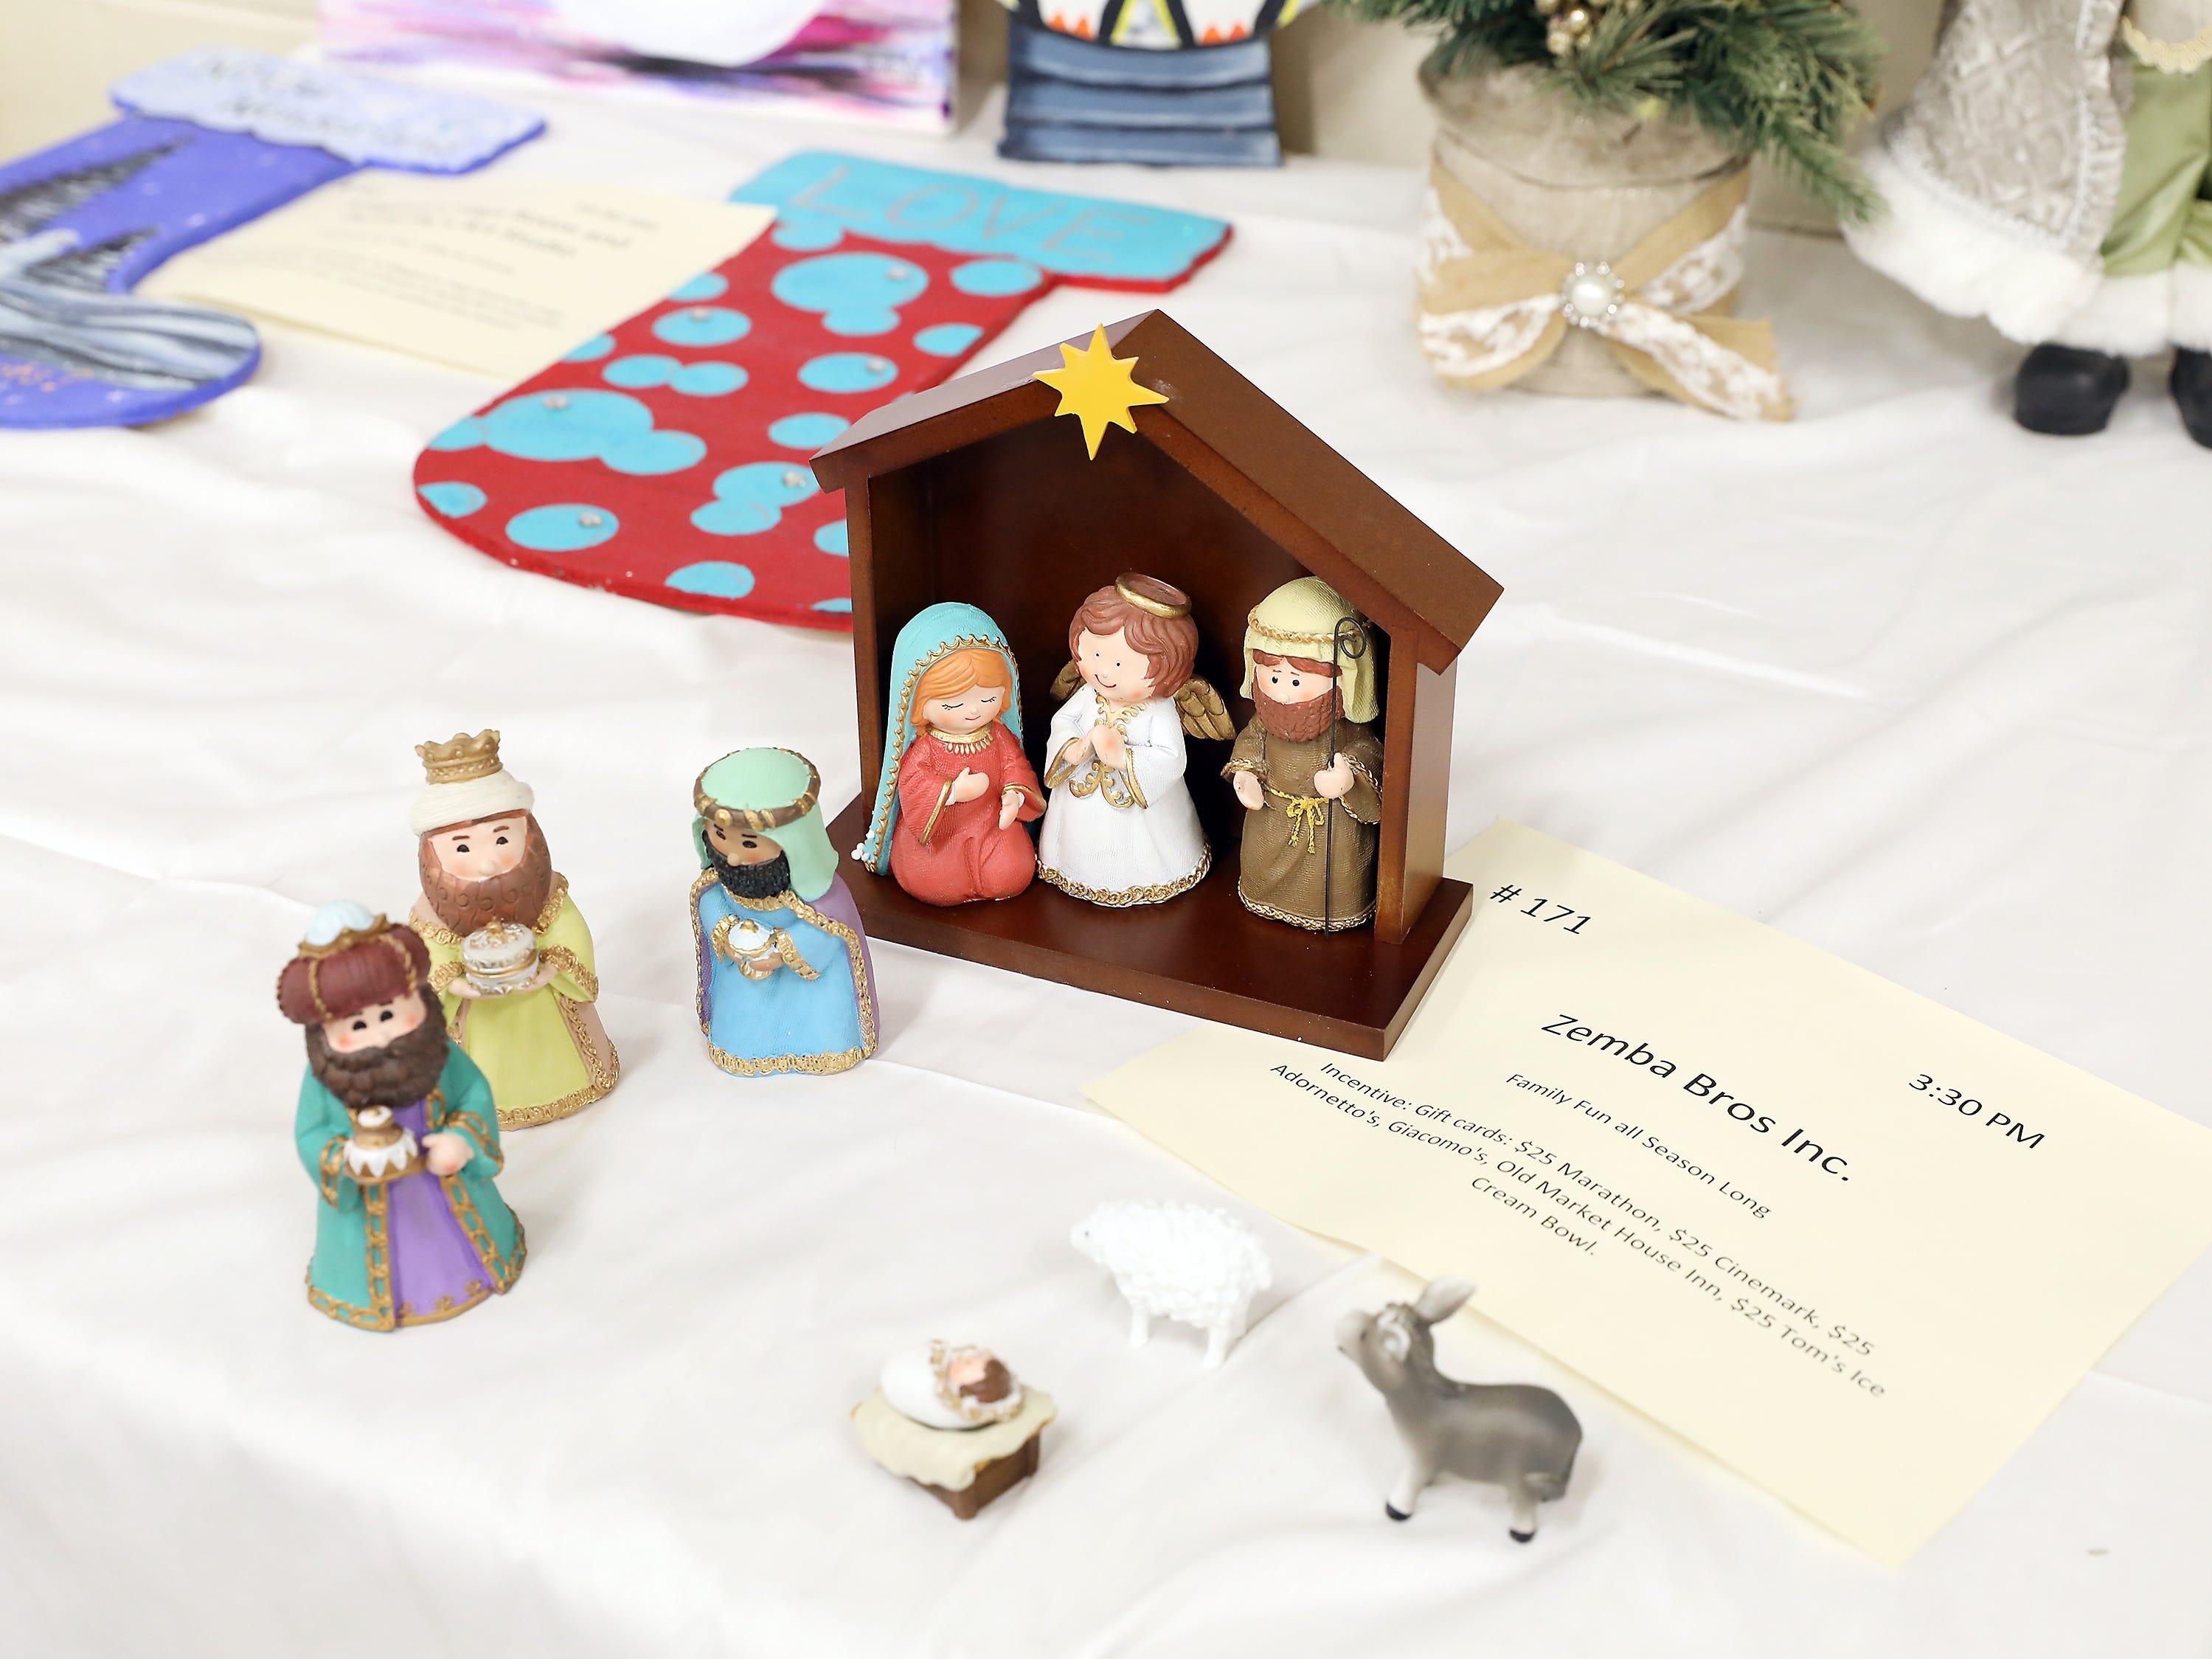 1713:30 PMZemba Bros Inc.OtherFamily Fun all Season LongChildren's Nativity setGift cards: $25 Marathon, $25 Cinemark, $25 Adornetto's, Giacomo's, Old Market House Inn, $25 Tom's Ice Cream Bowl.